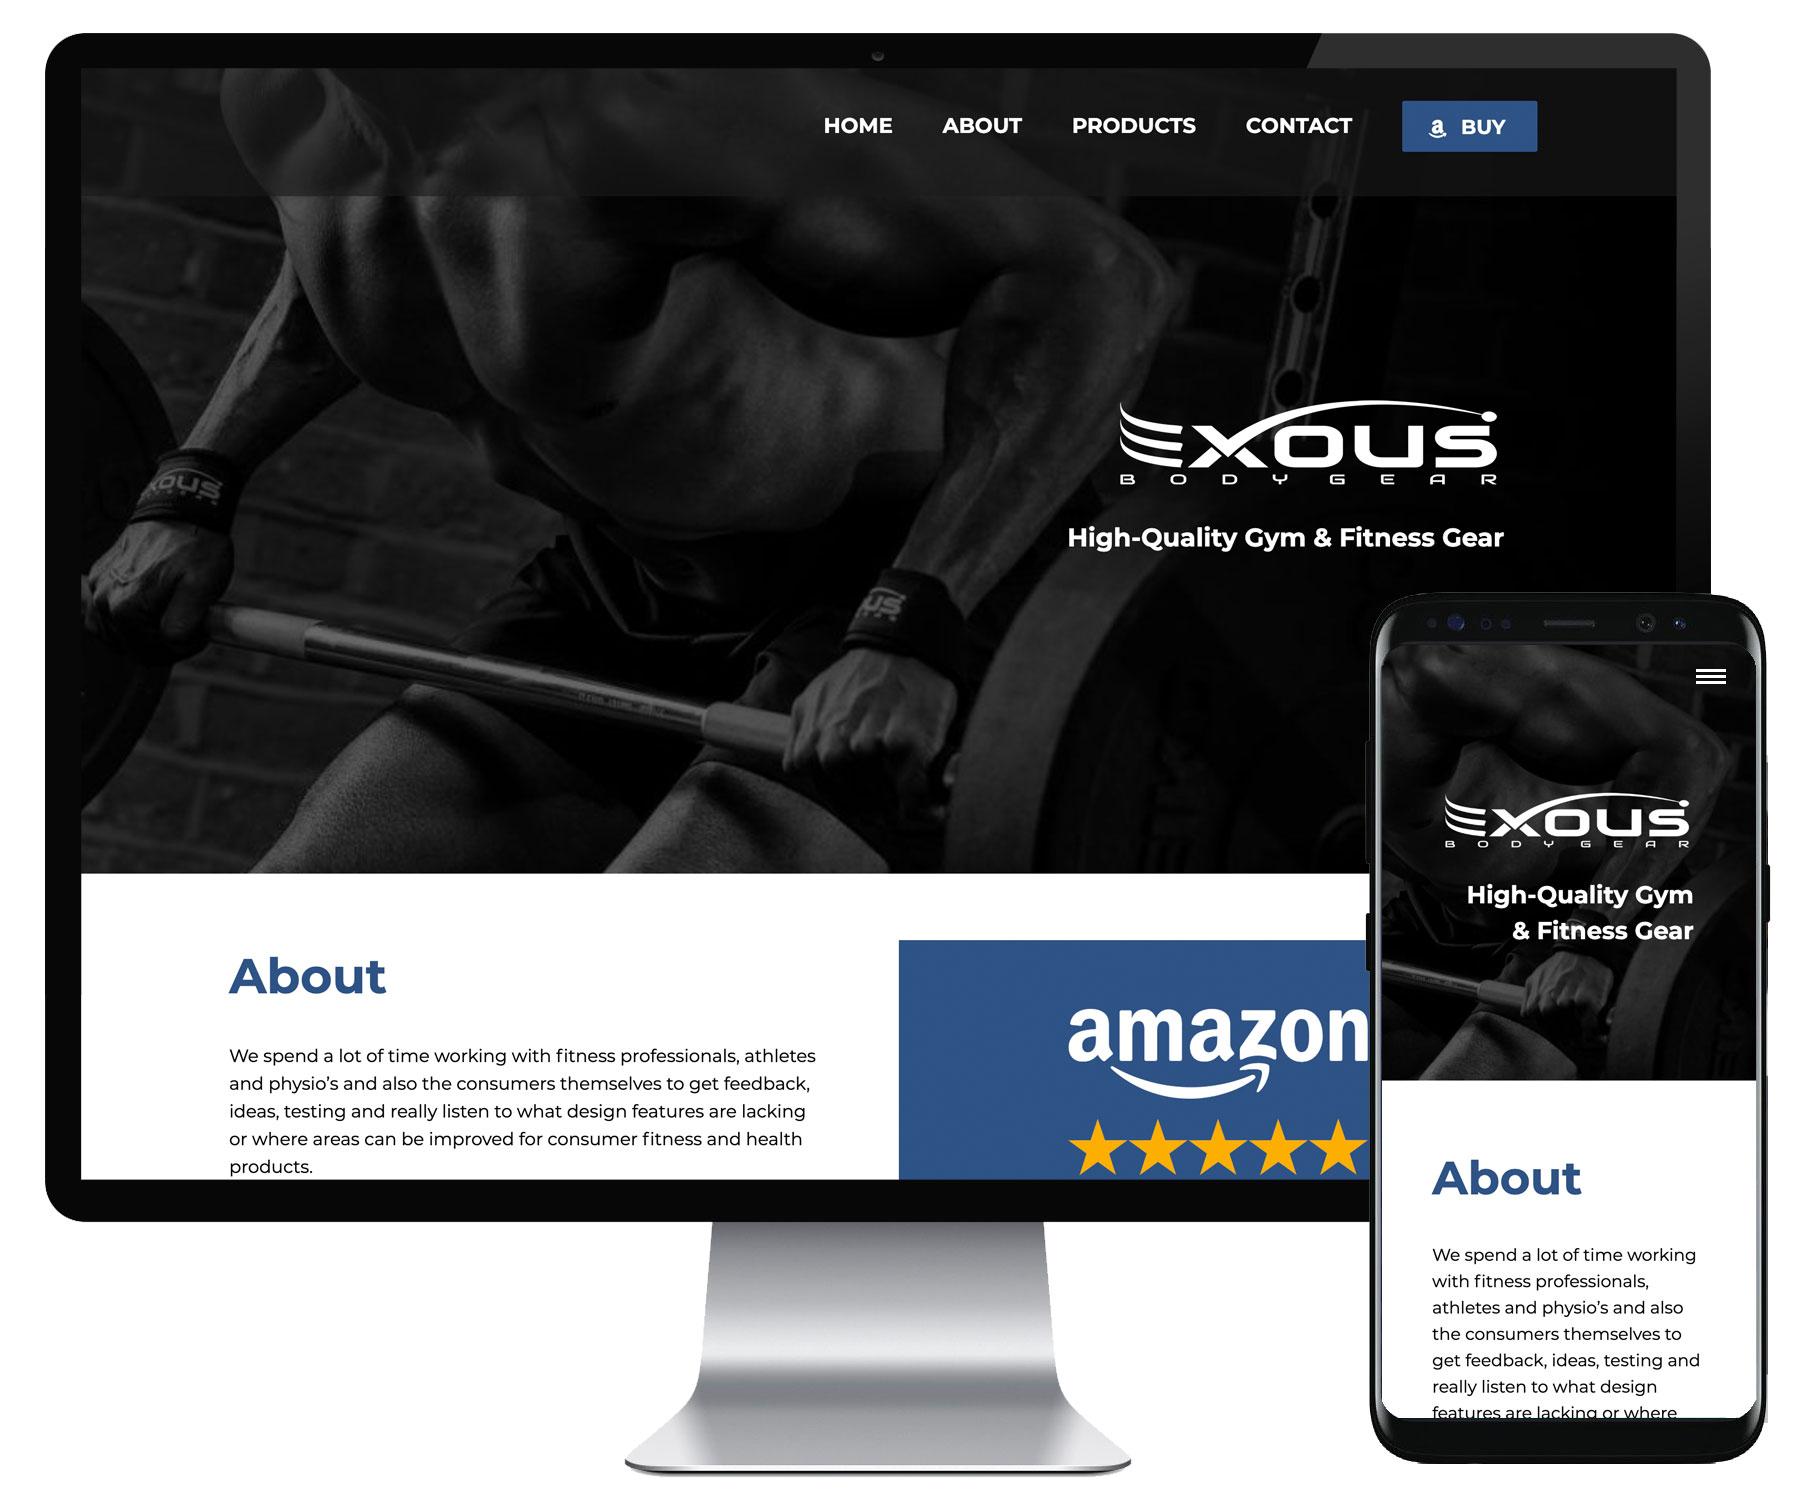 Exous Bodygear website